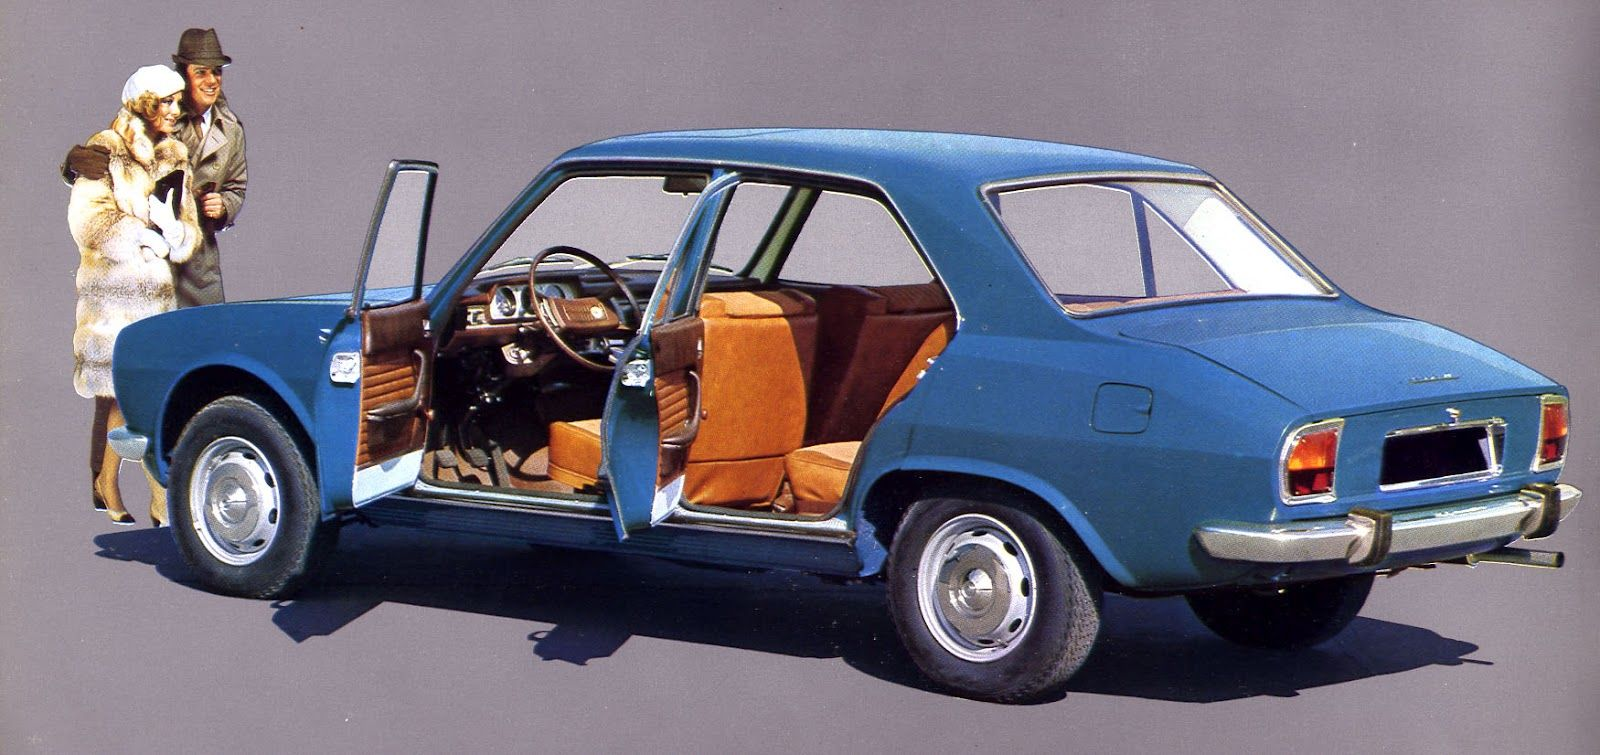 Old Cars Canada: 1969 Peugeot 504 | Motor Classics | Pinterest ...